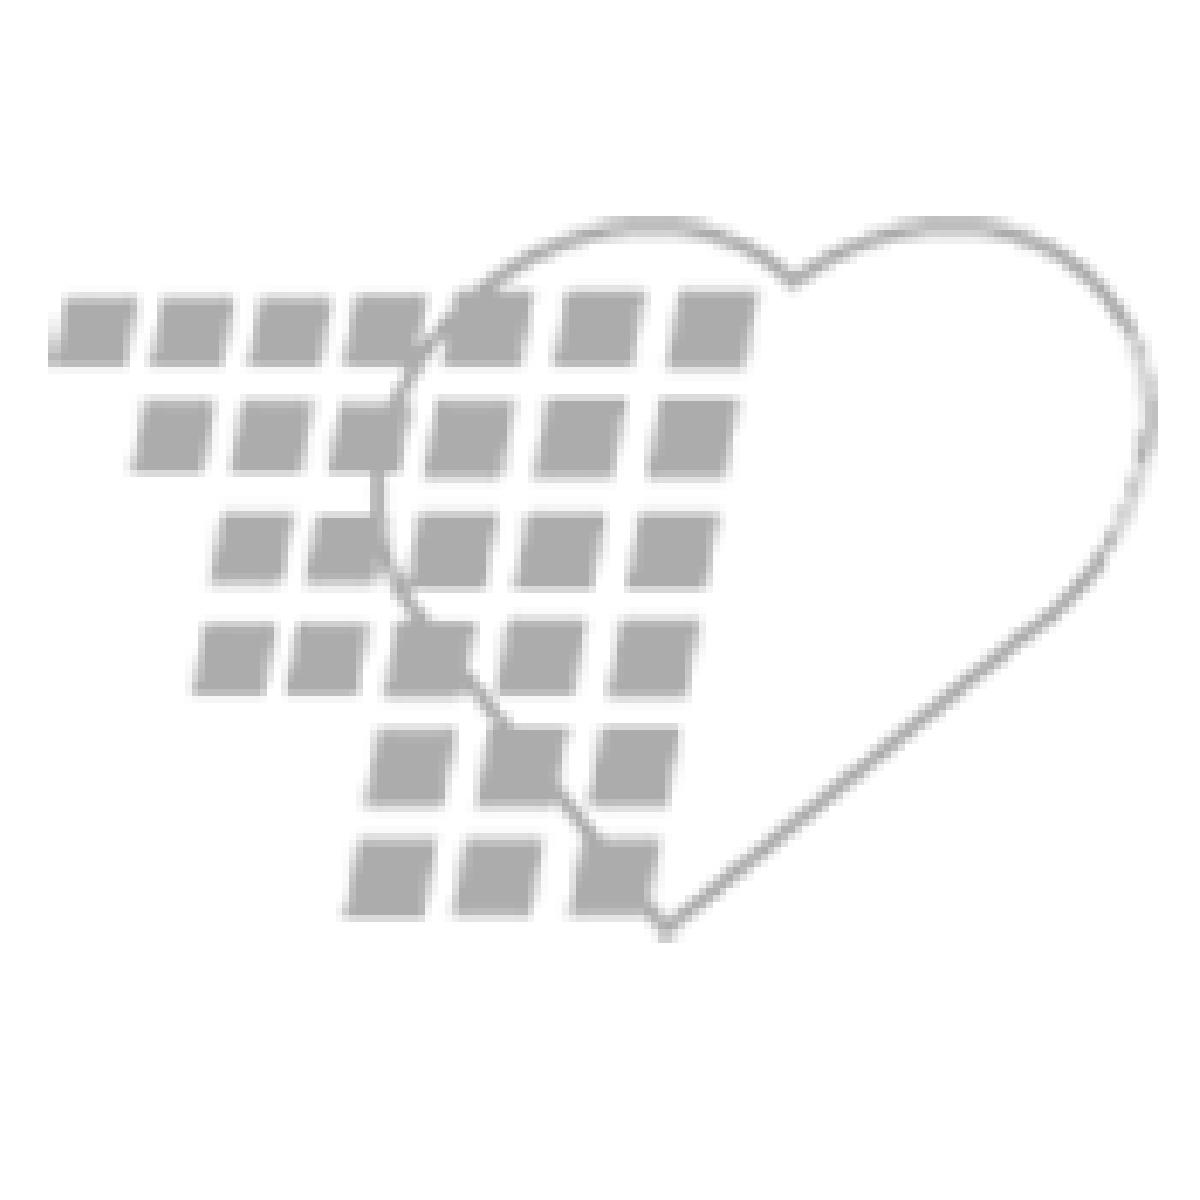 06-26-2500P B.Braun Introcan Safety IV Catheter